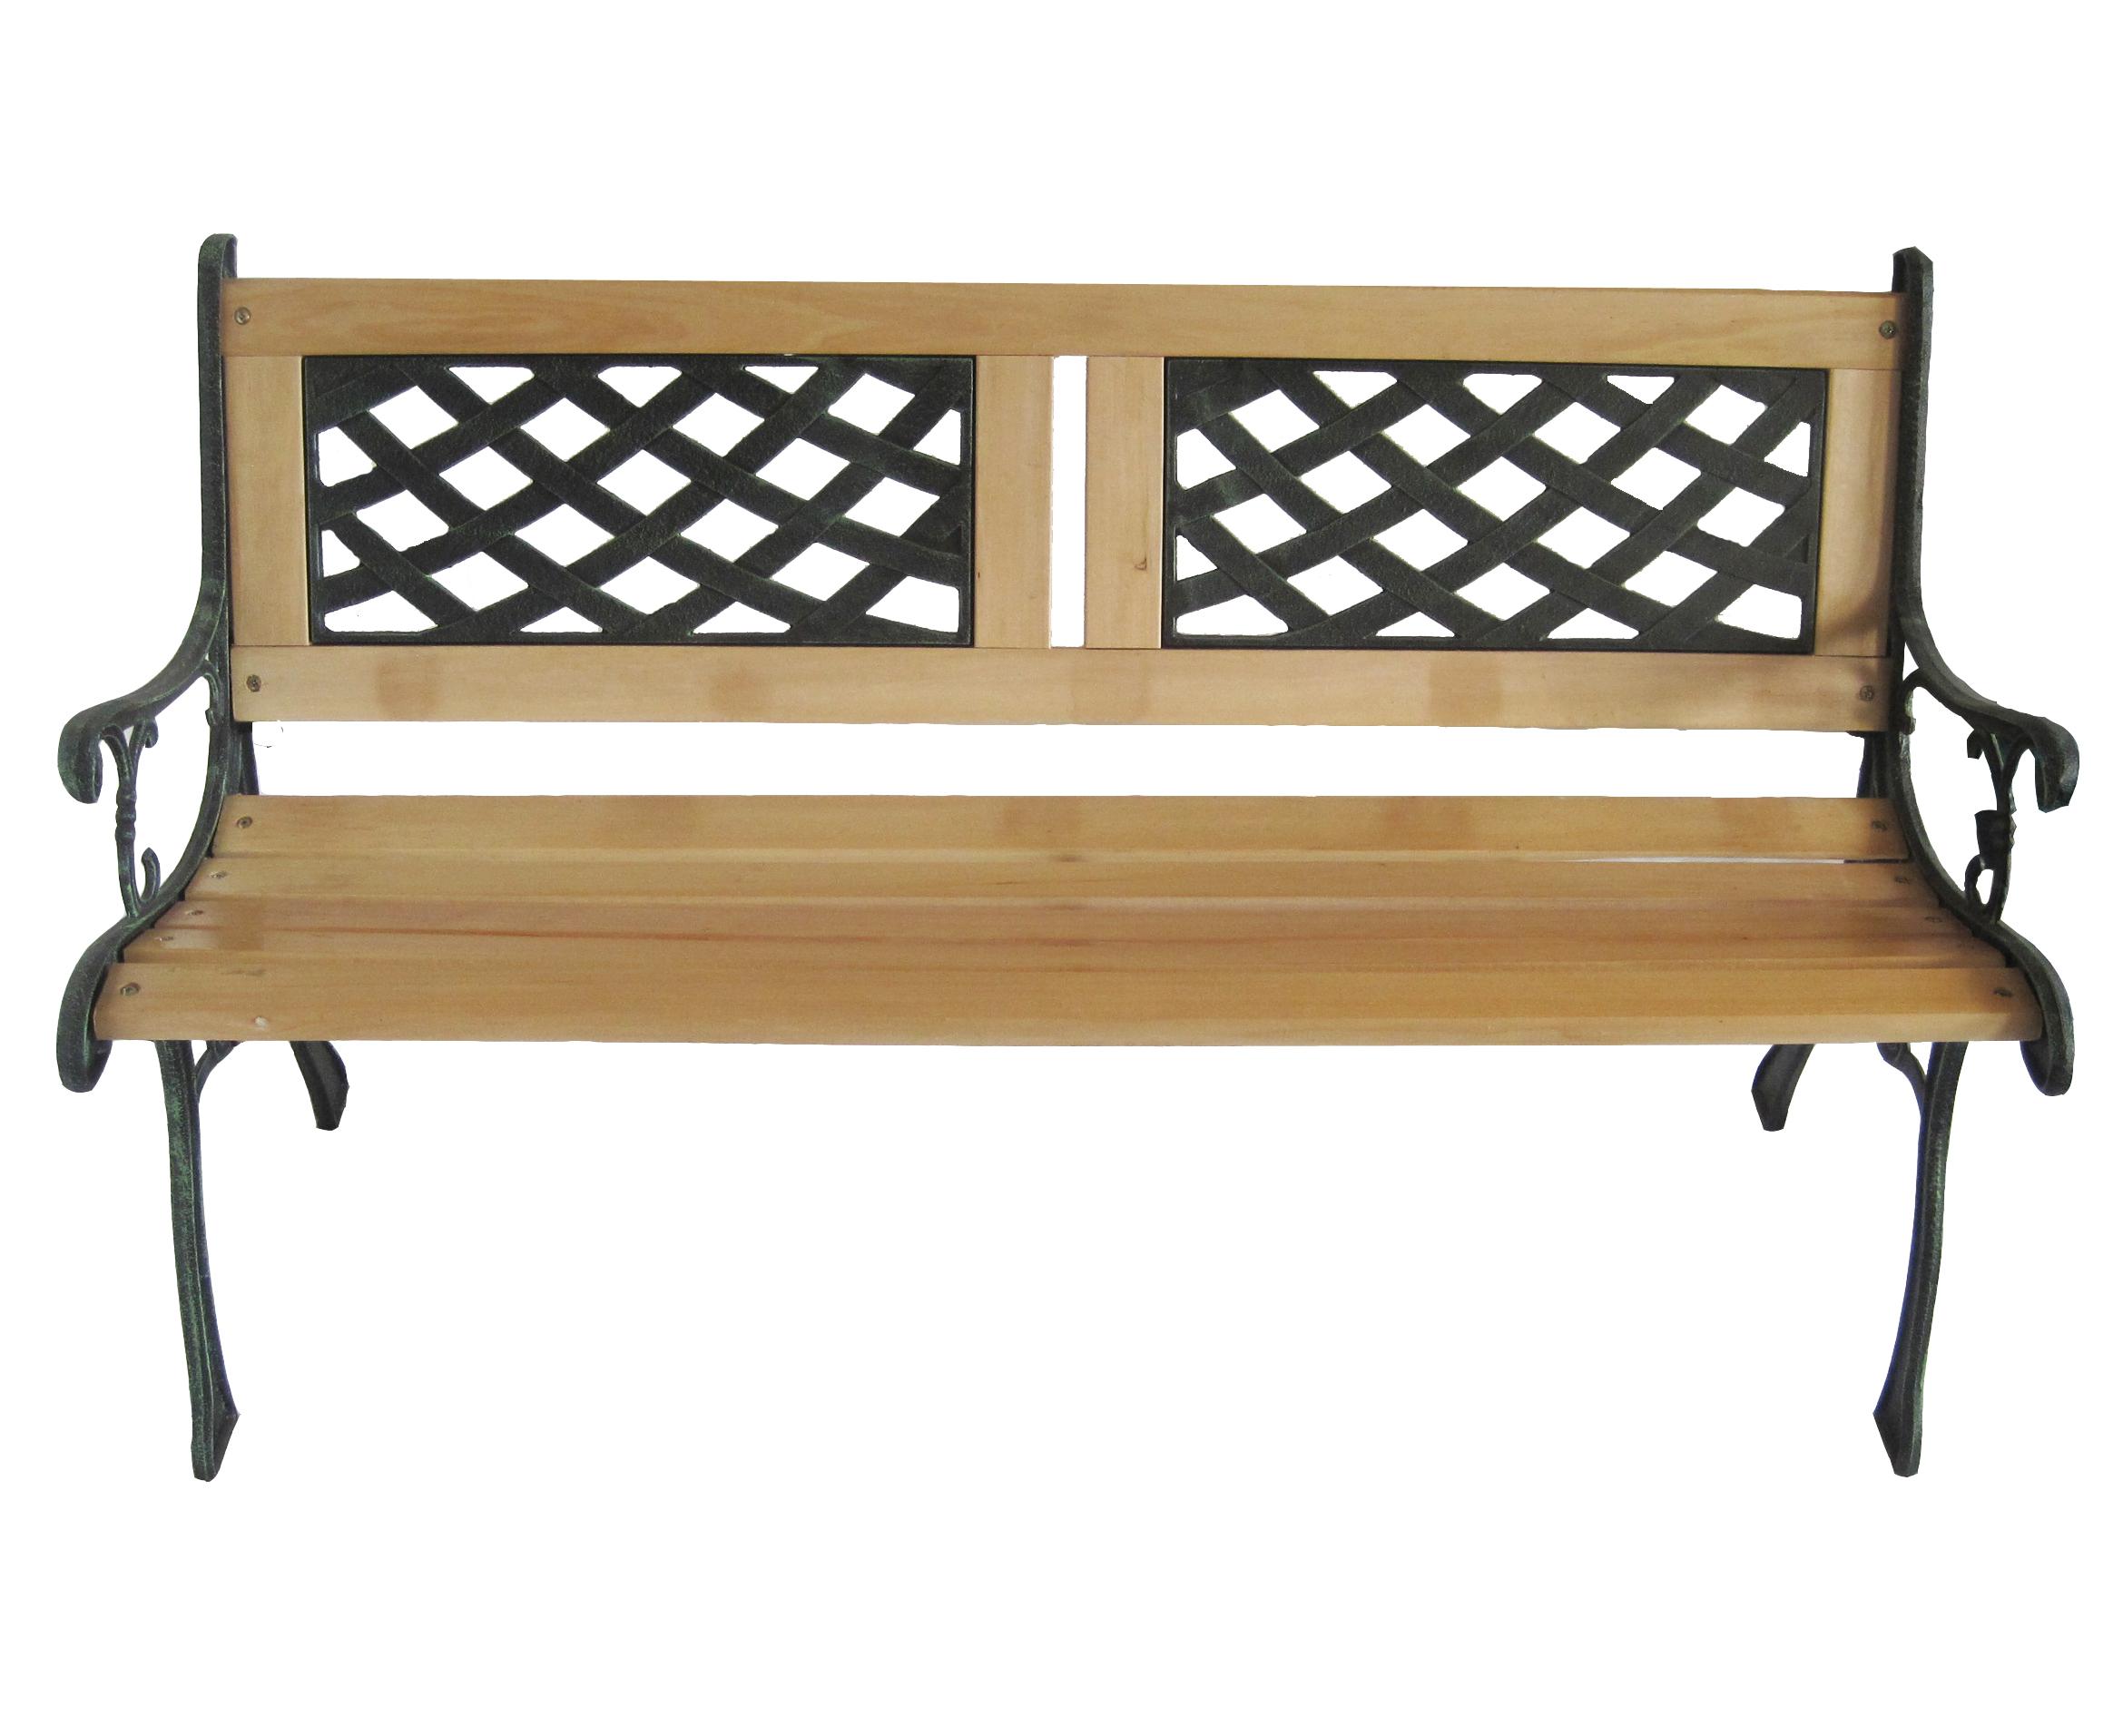 Outdoor Wooden 3 Seater Lattice Slat Garden Bench With